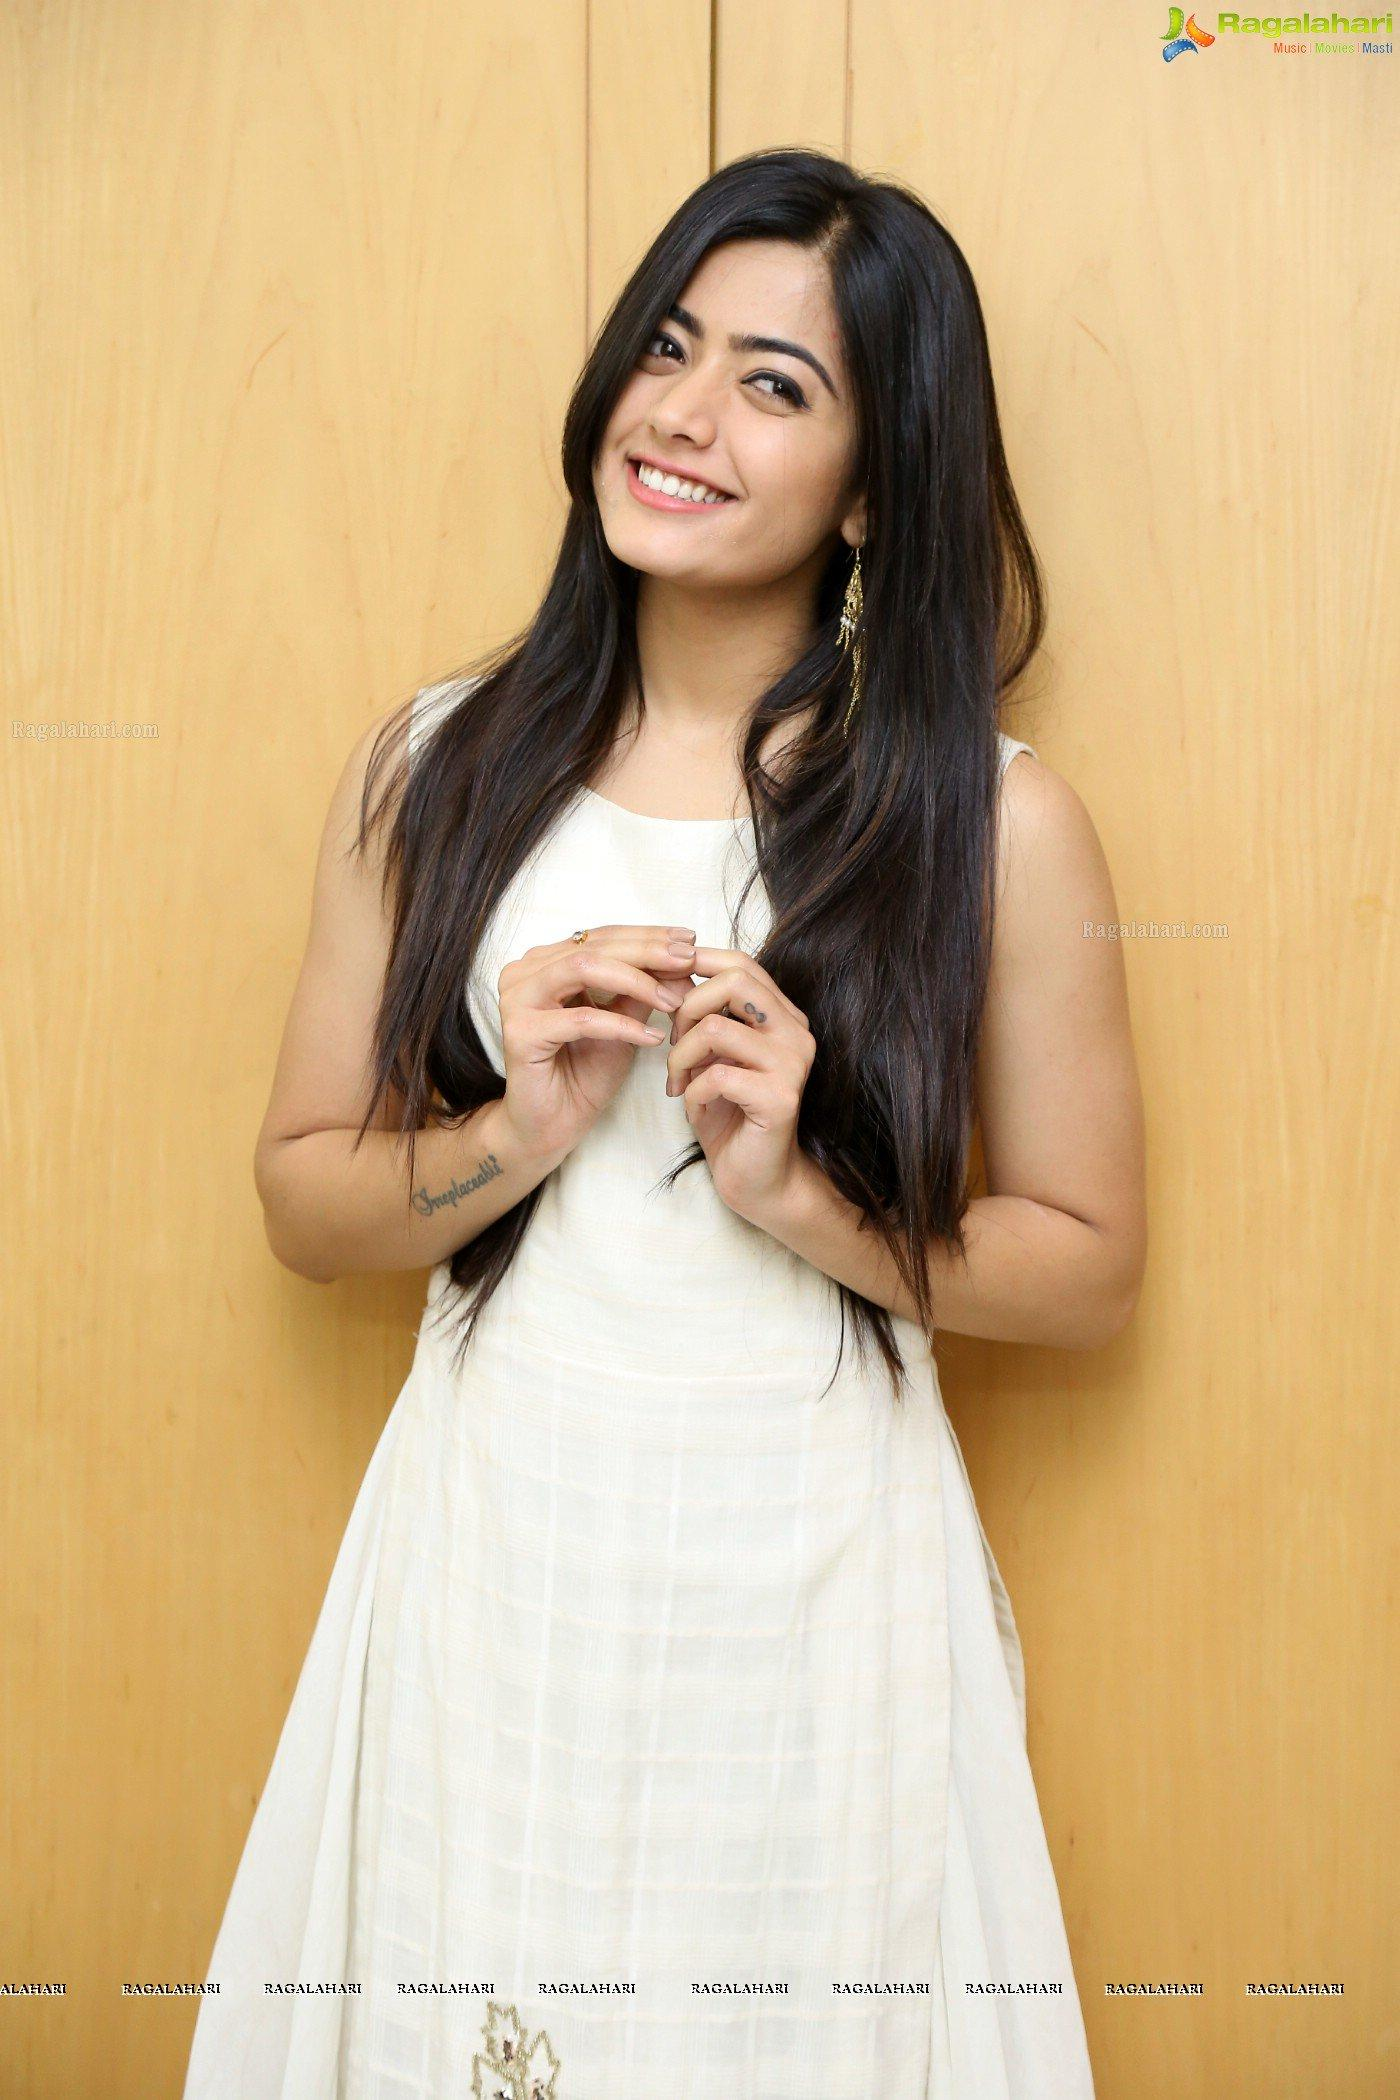 Rashmika Mandanna at Chalo Interview Image 50